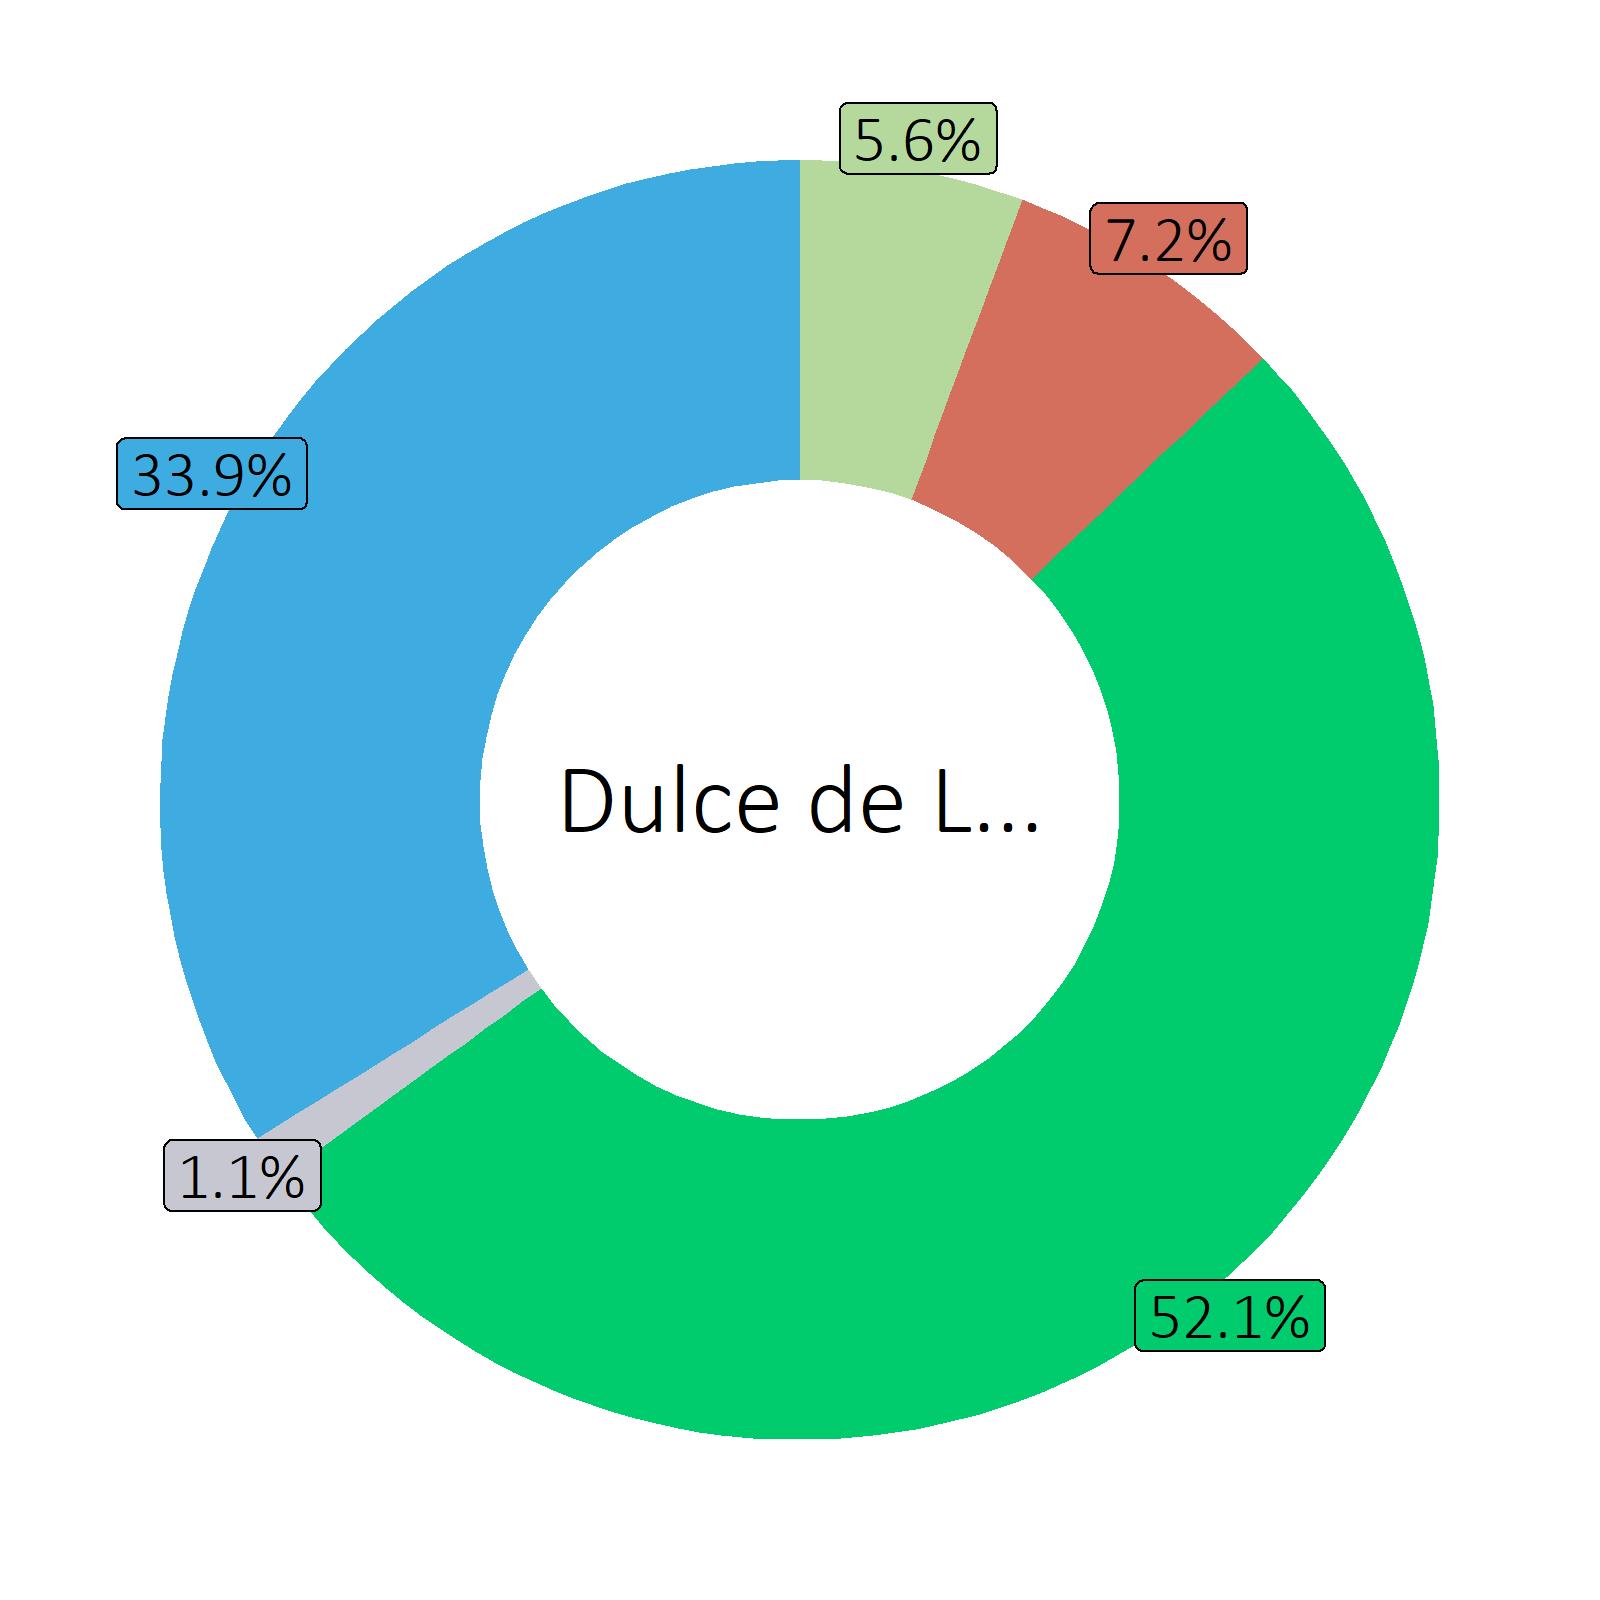 Bestandteile Dulce de Leche